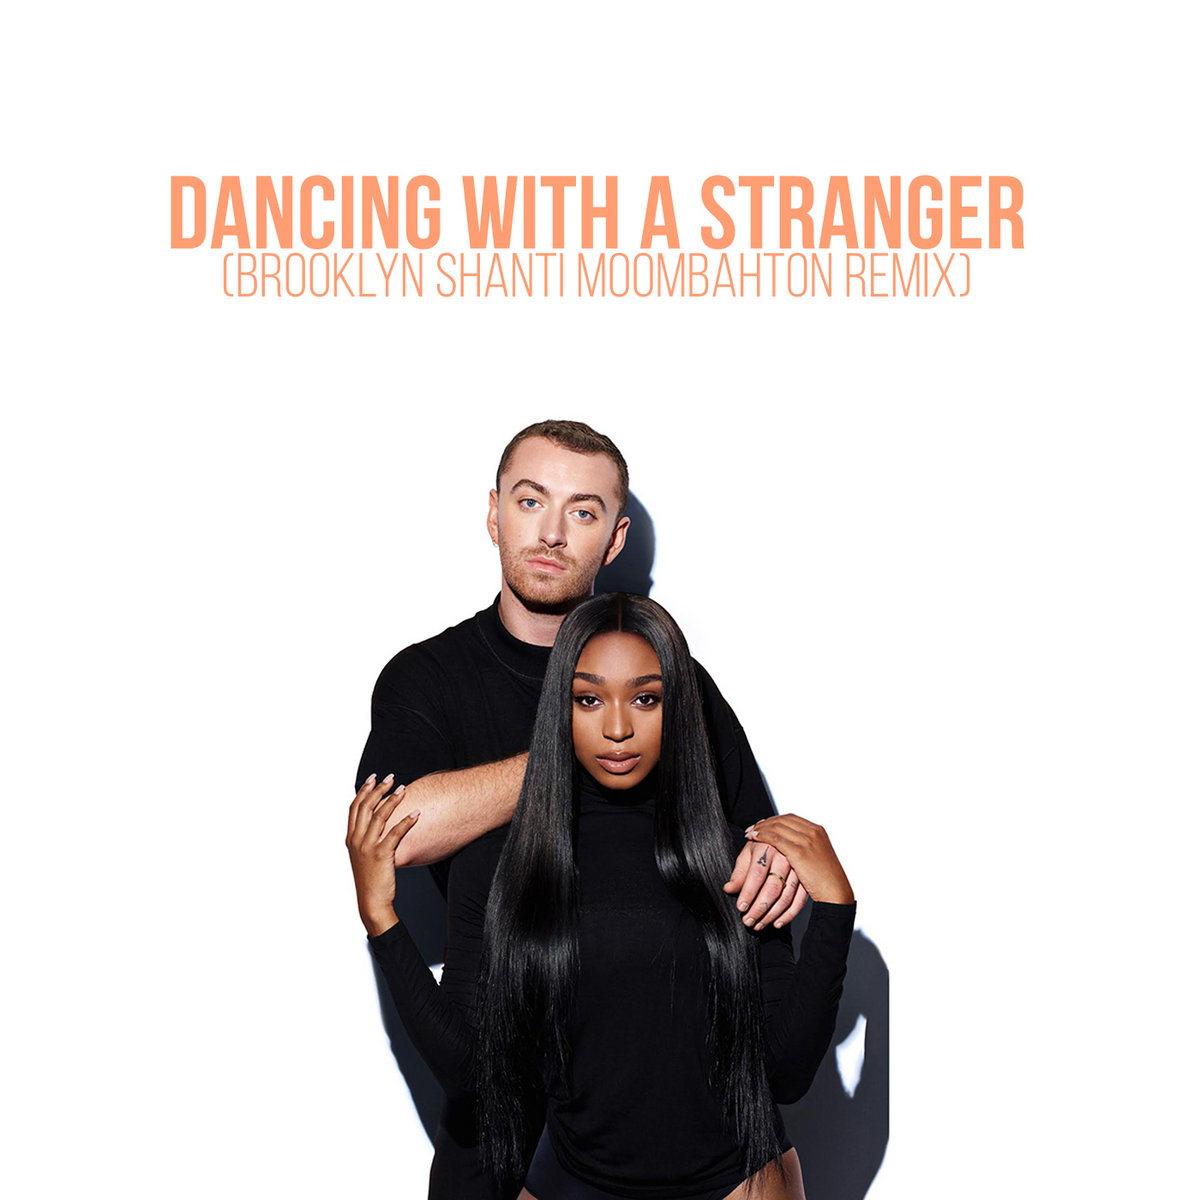 Dancing with a Stranger (Brooklyn Shanti Moombahton remix